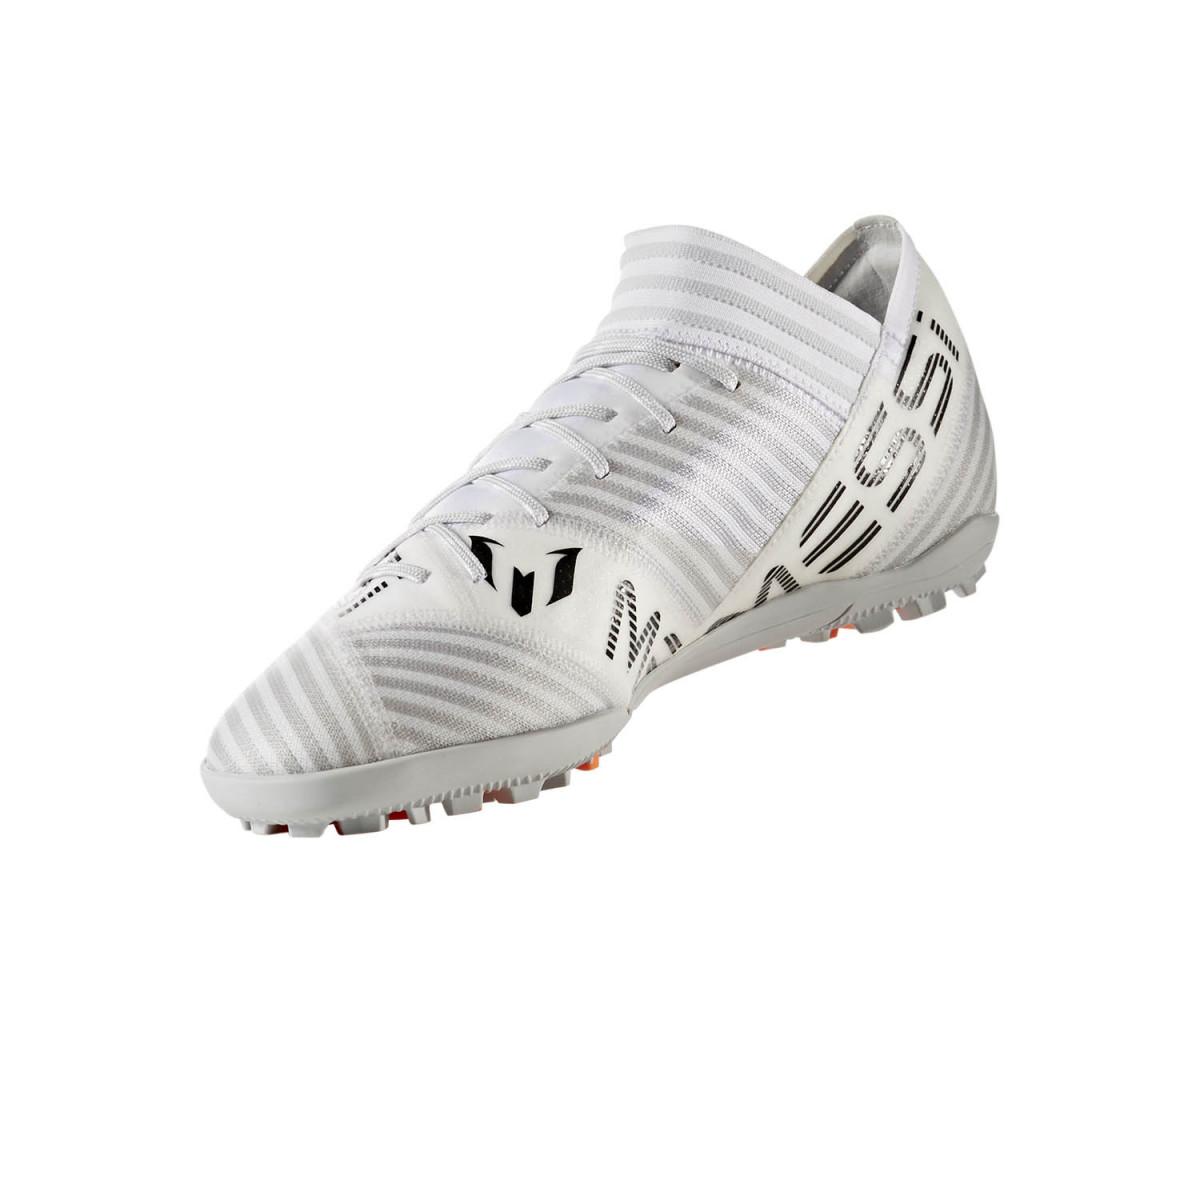 bbf7c6a088 Botines Adidas Nemeziz Messi Tango 17.3 Tf - Botines - Fútbol ...